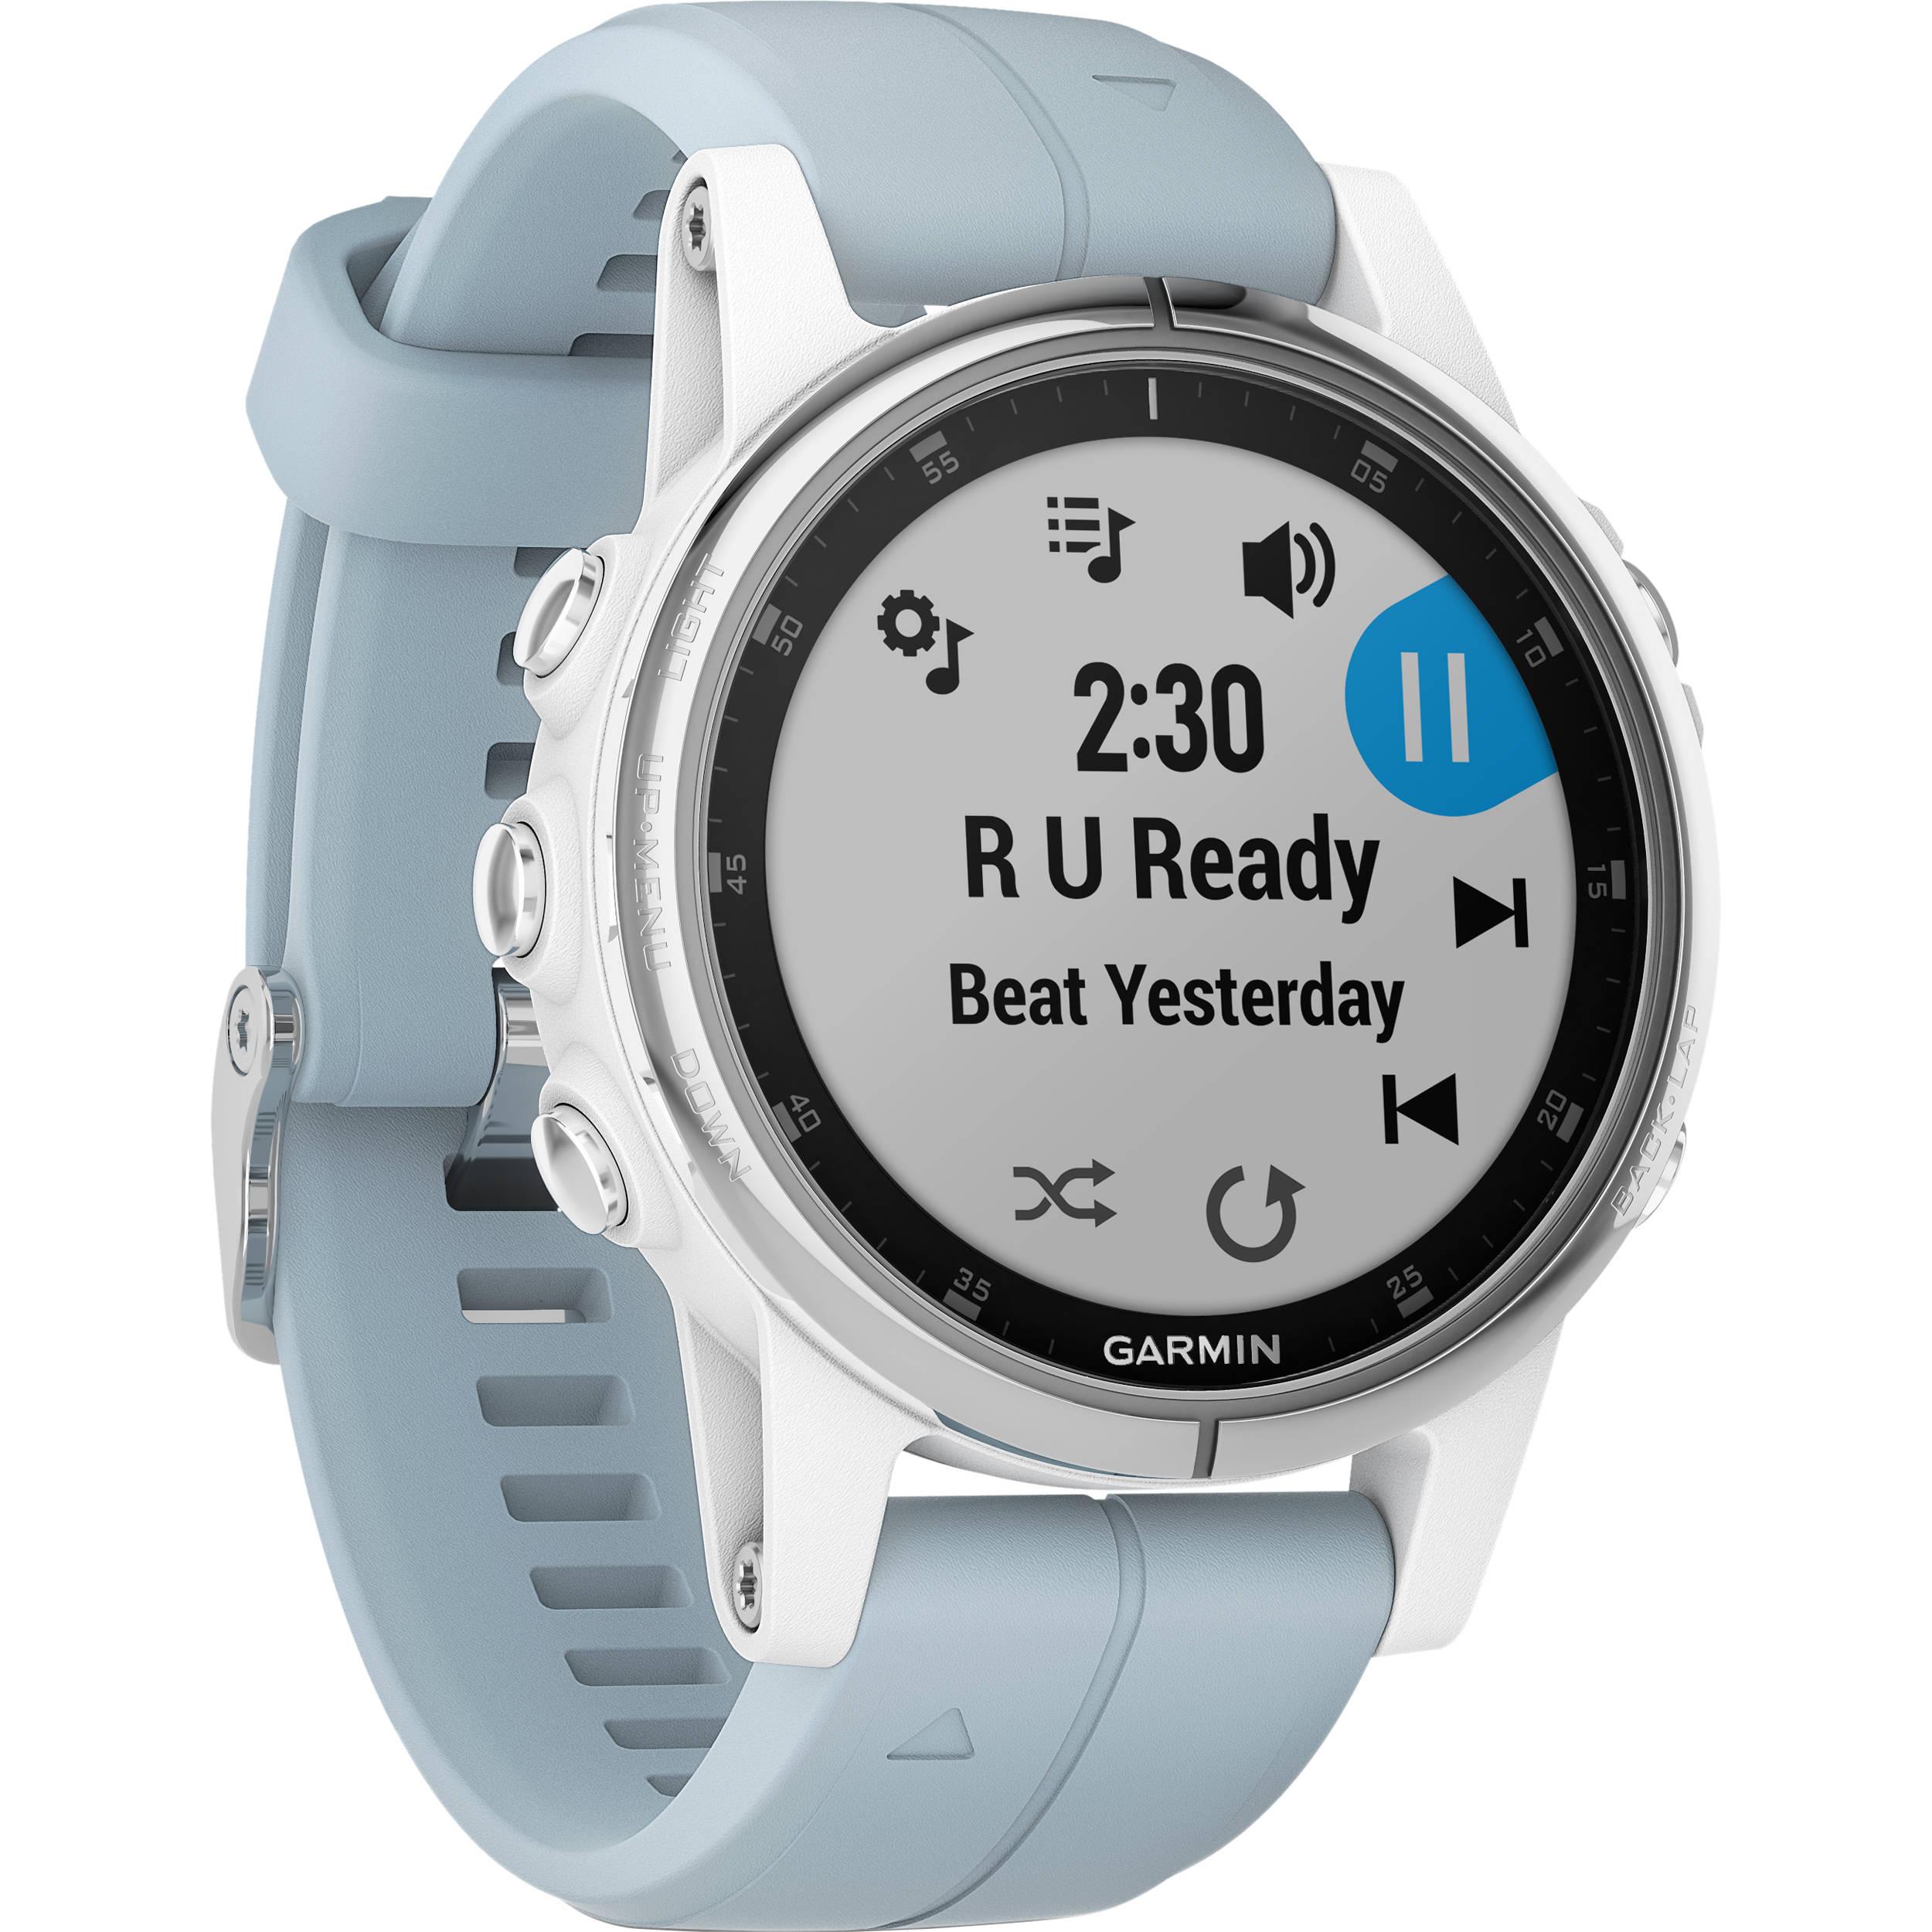 c34e790768bc Garmin fenix 5S Plus Multi-Sport Training GPS Watch (42mm, White with Sea  Foam Band)